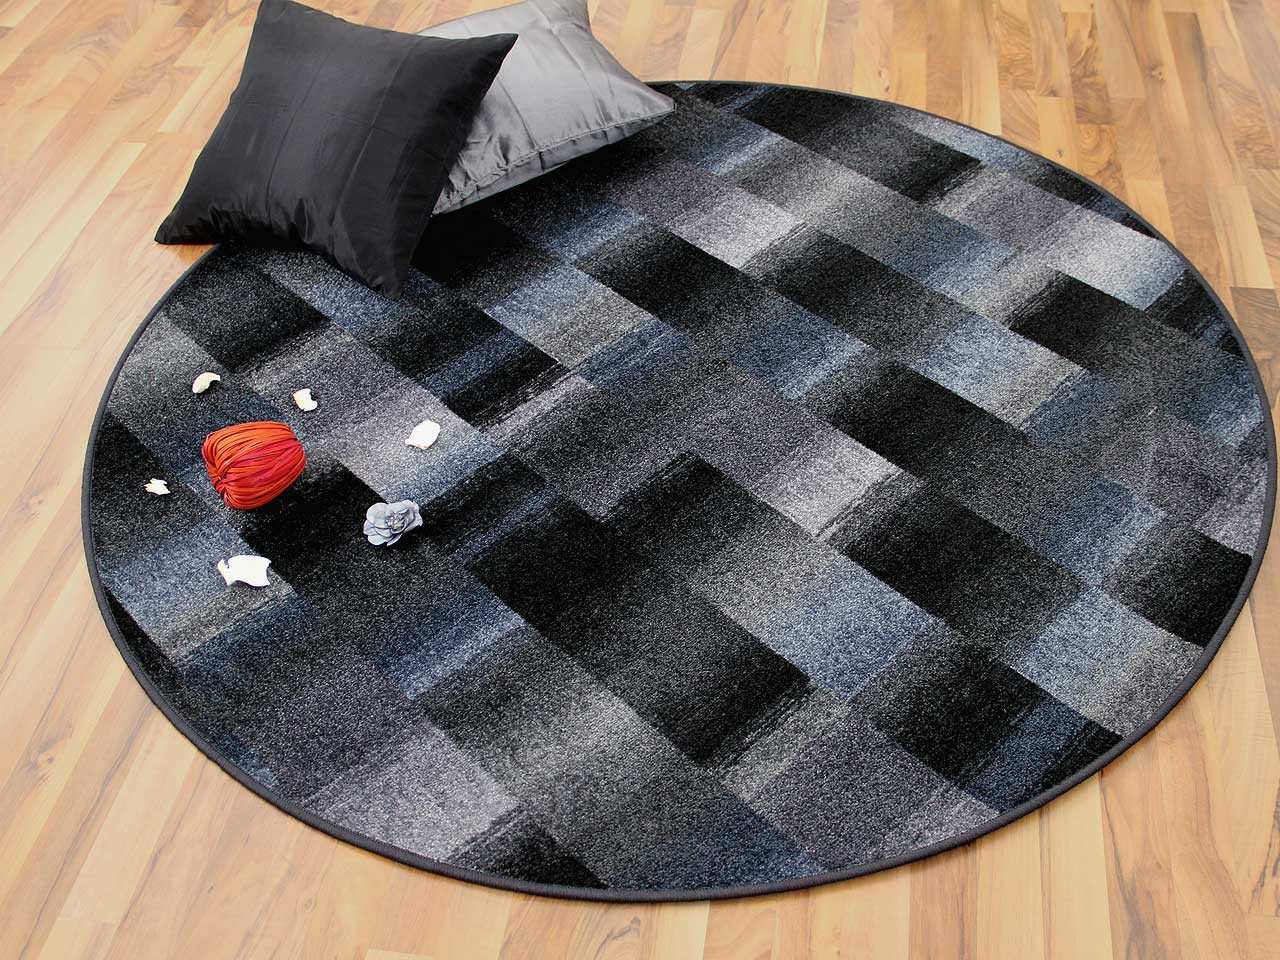 designer velour teppich mystic karo blau grau rund teppiche designerteppiche mystic teppiche. Black Bedroom Furniture Sets. Home Design Ideas